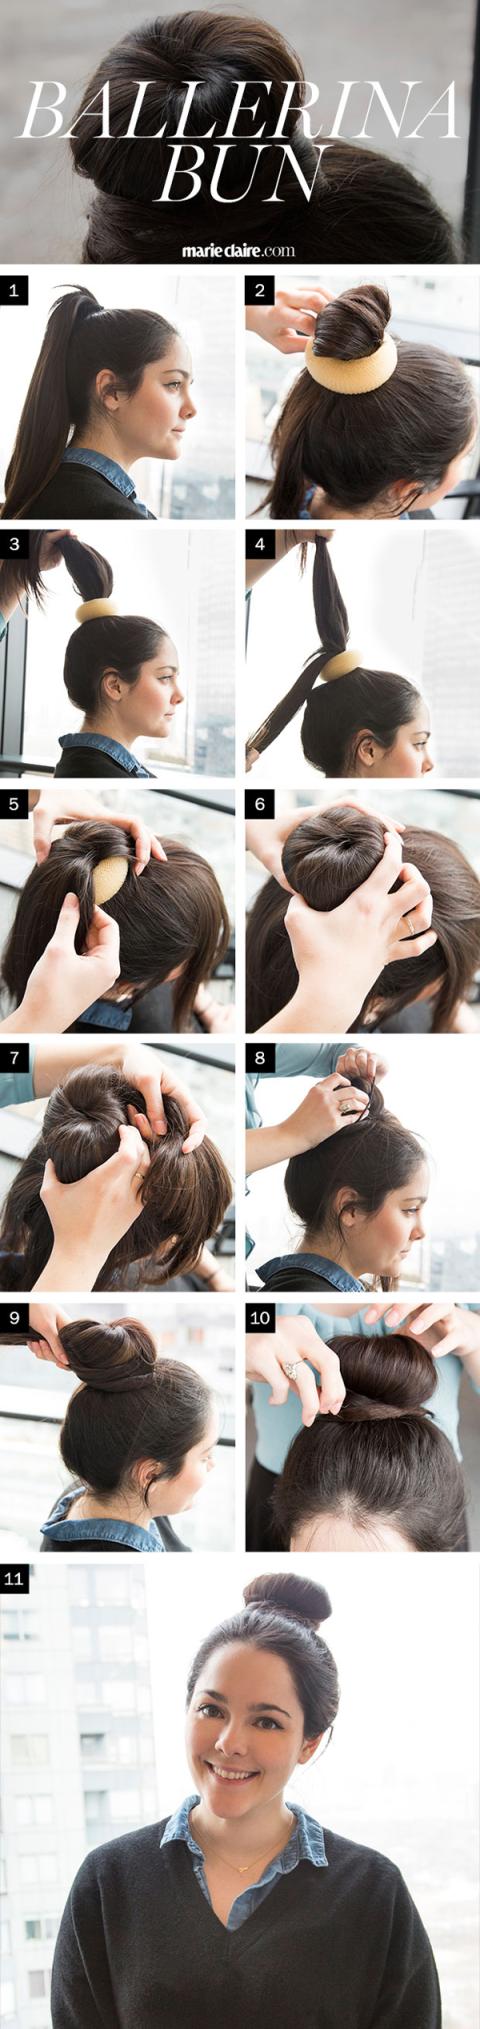 Hair How-To: The Perfect Ballerina Bun